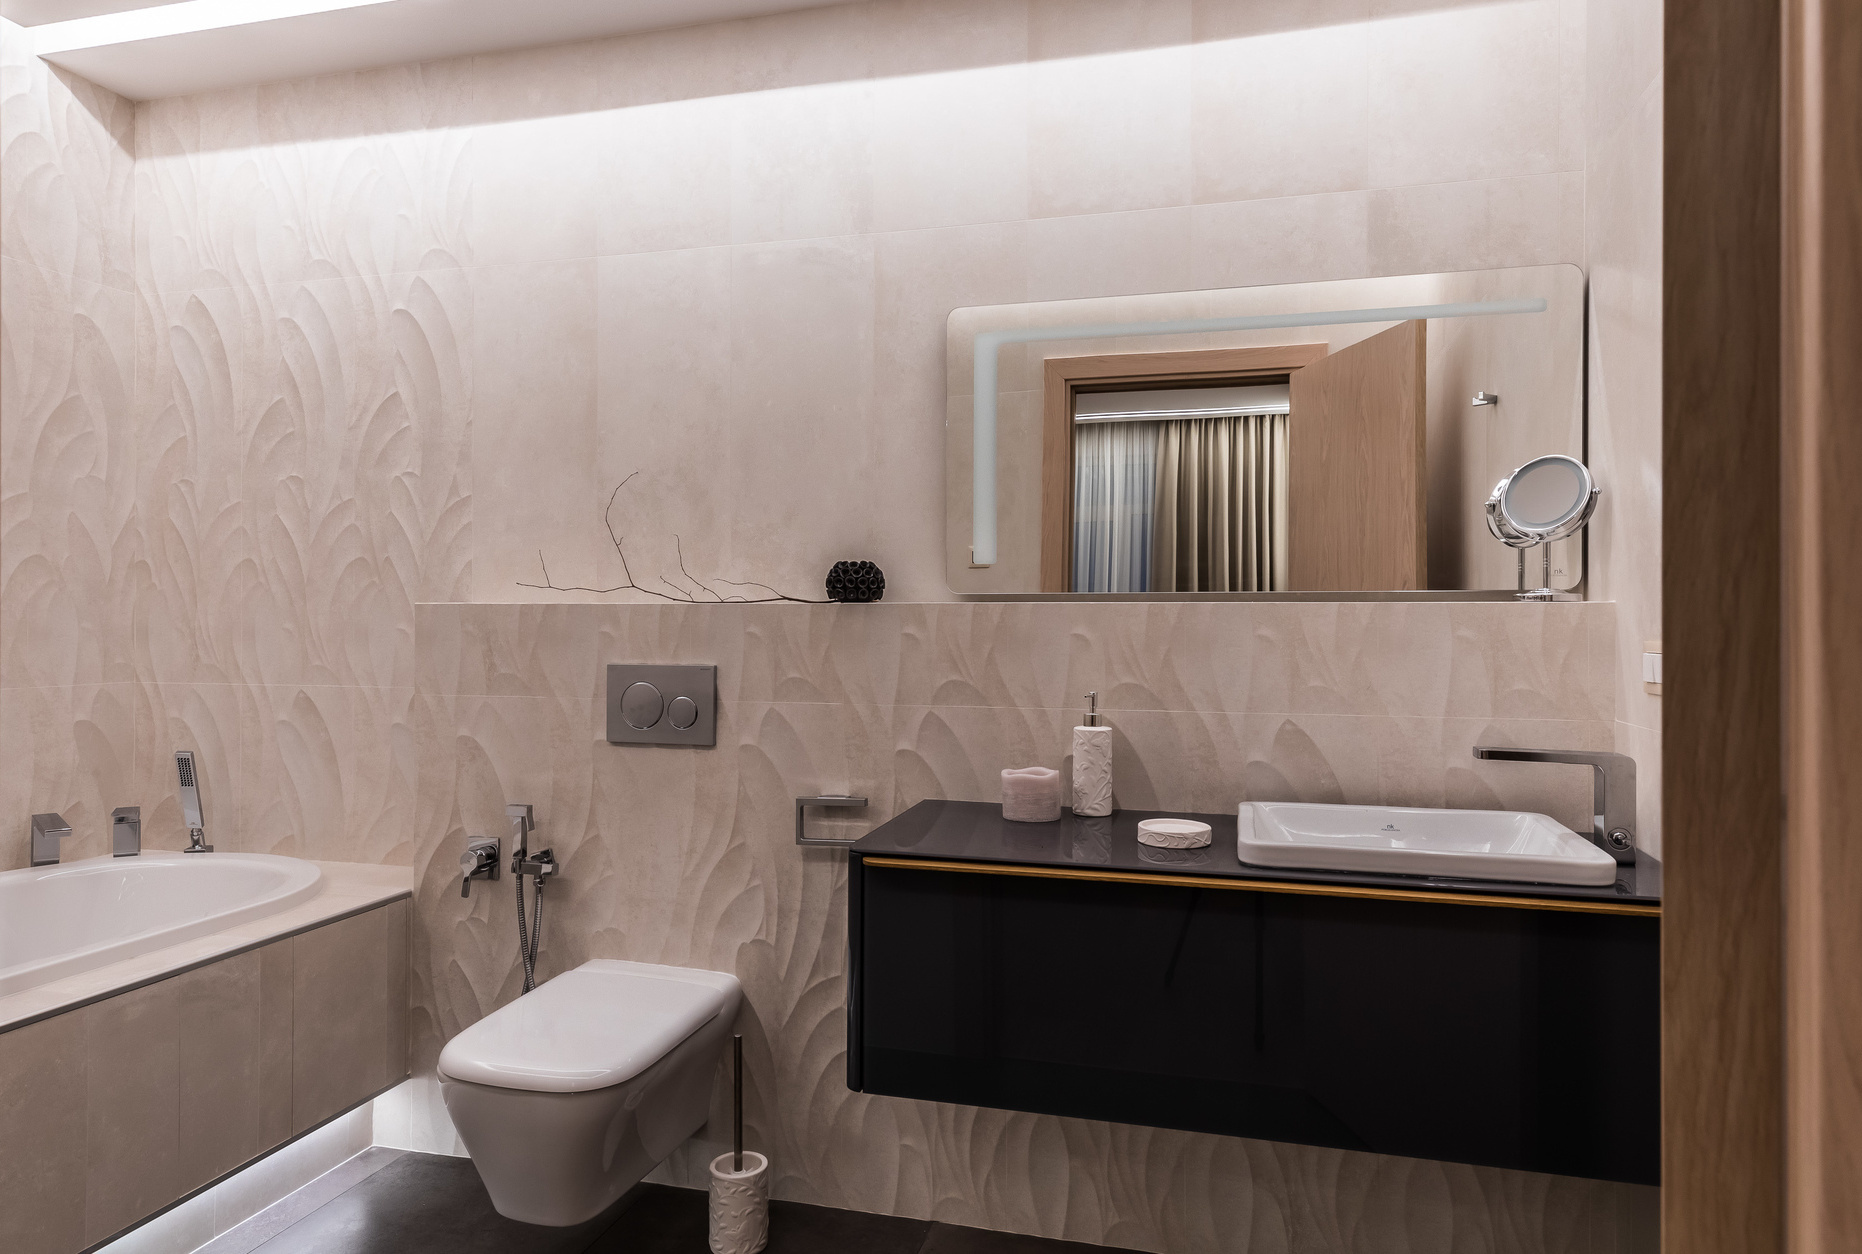 Розовая пудра: 12 ванных комнат в розовой гамме (галерея 0, фото 5)